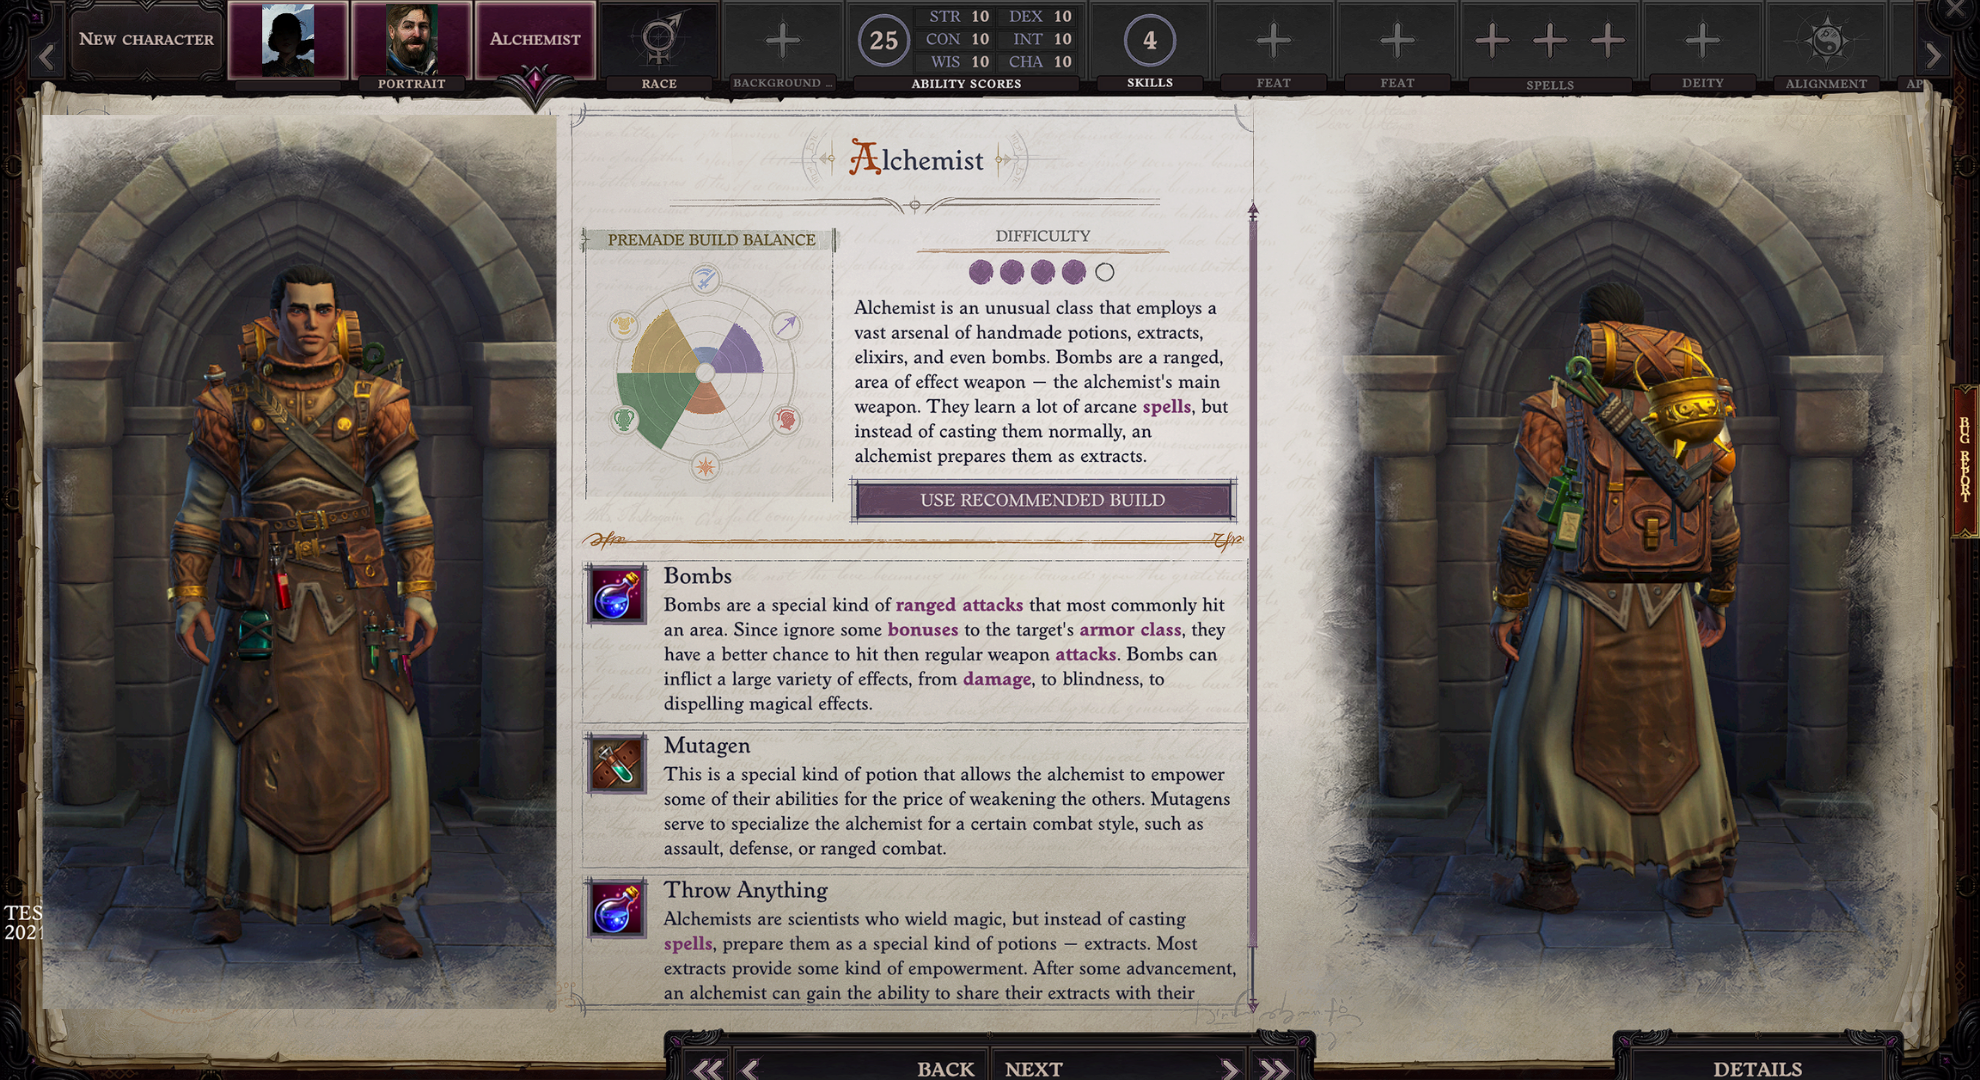 Pathfinder Wrath of the Righteous alchemist